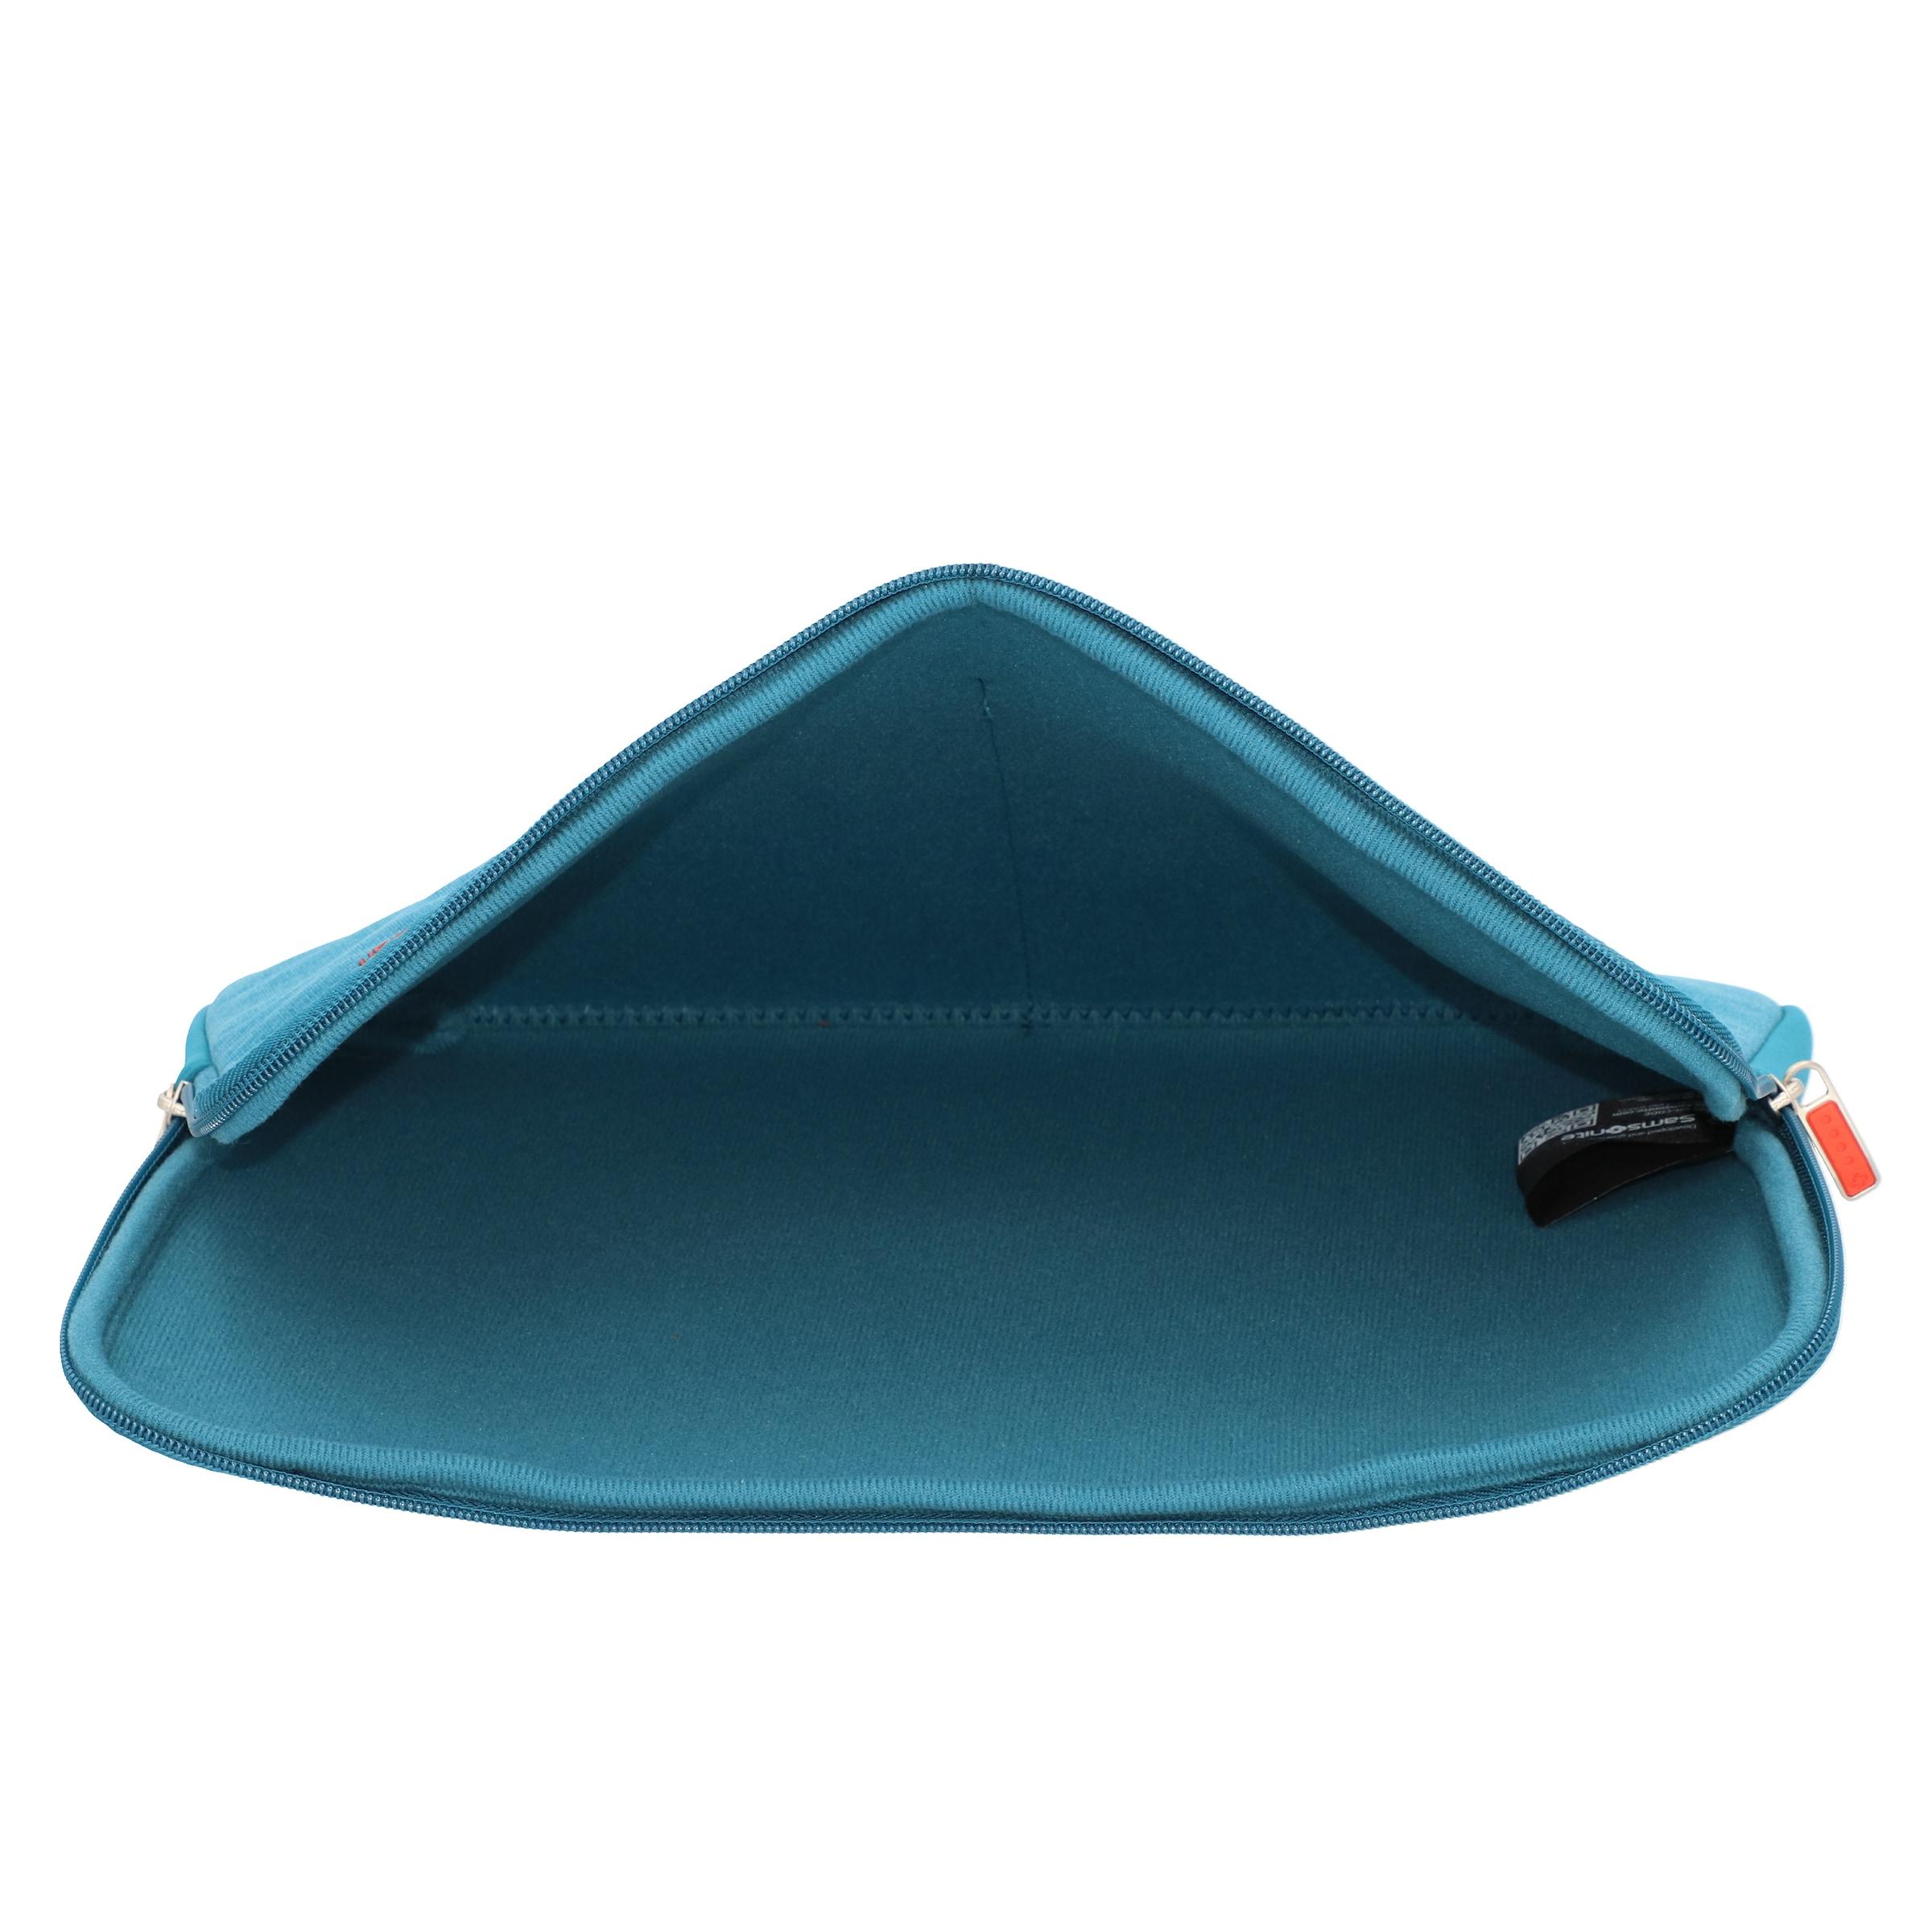 Laptophülle 0' 2 Himmelblau Samsonite 'colorshield In htxrQsdC